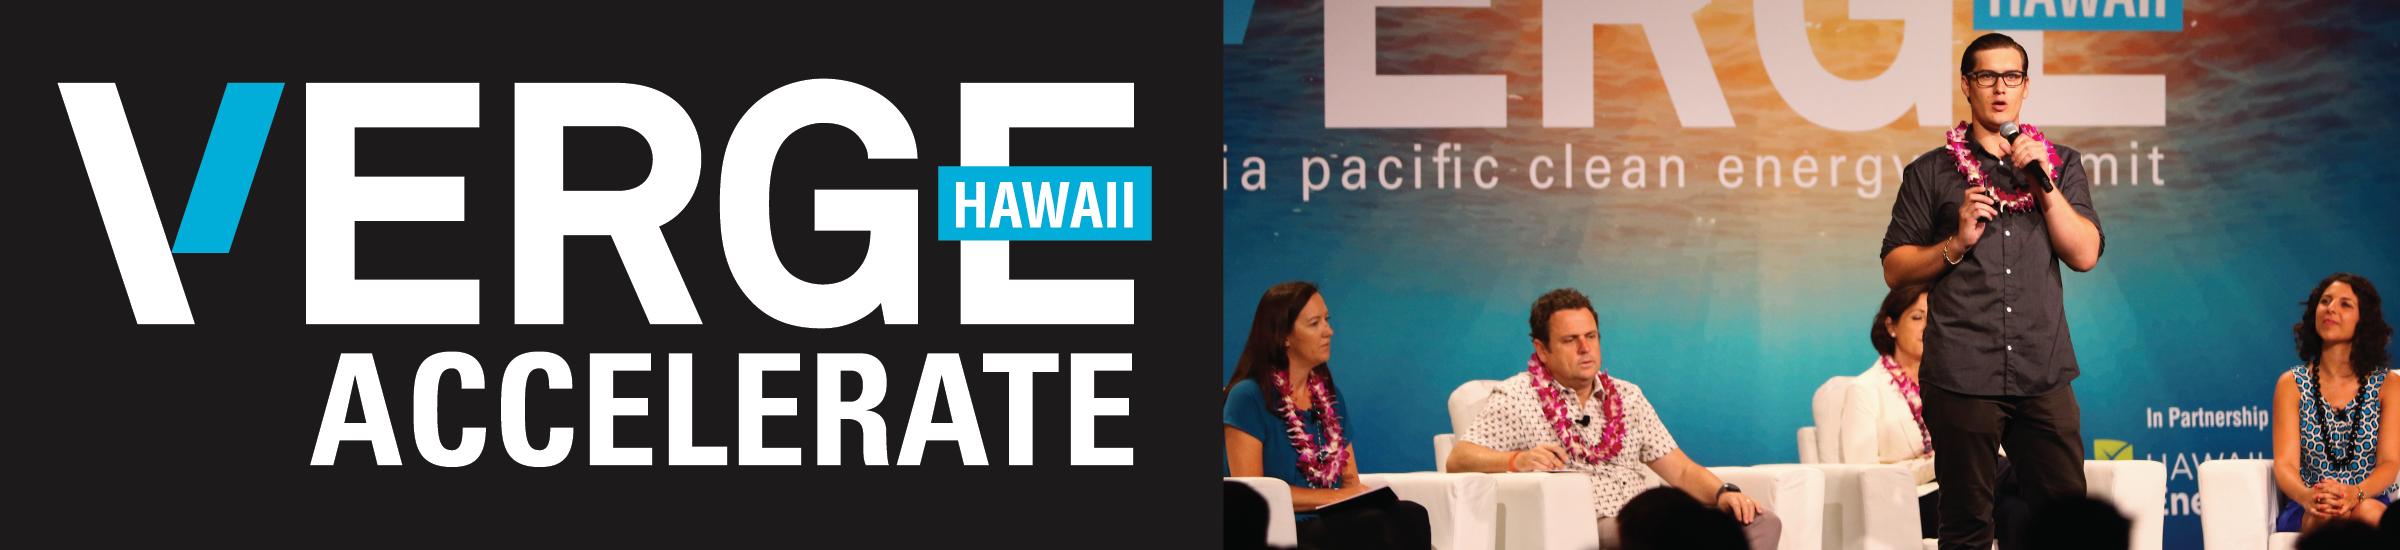 VERGE Hawaii 2017 Accelerate